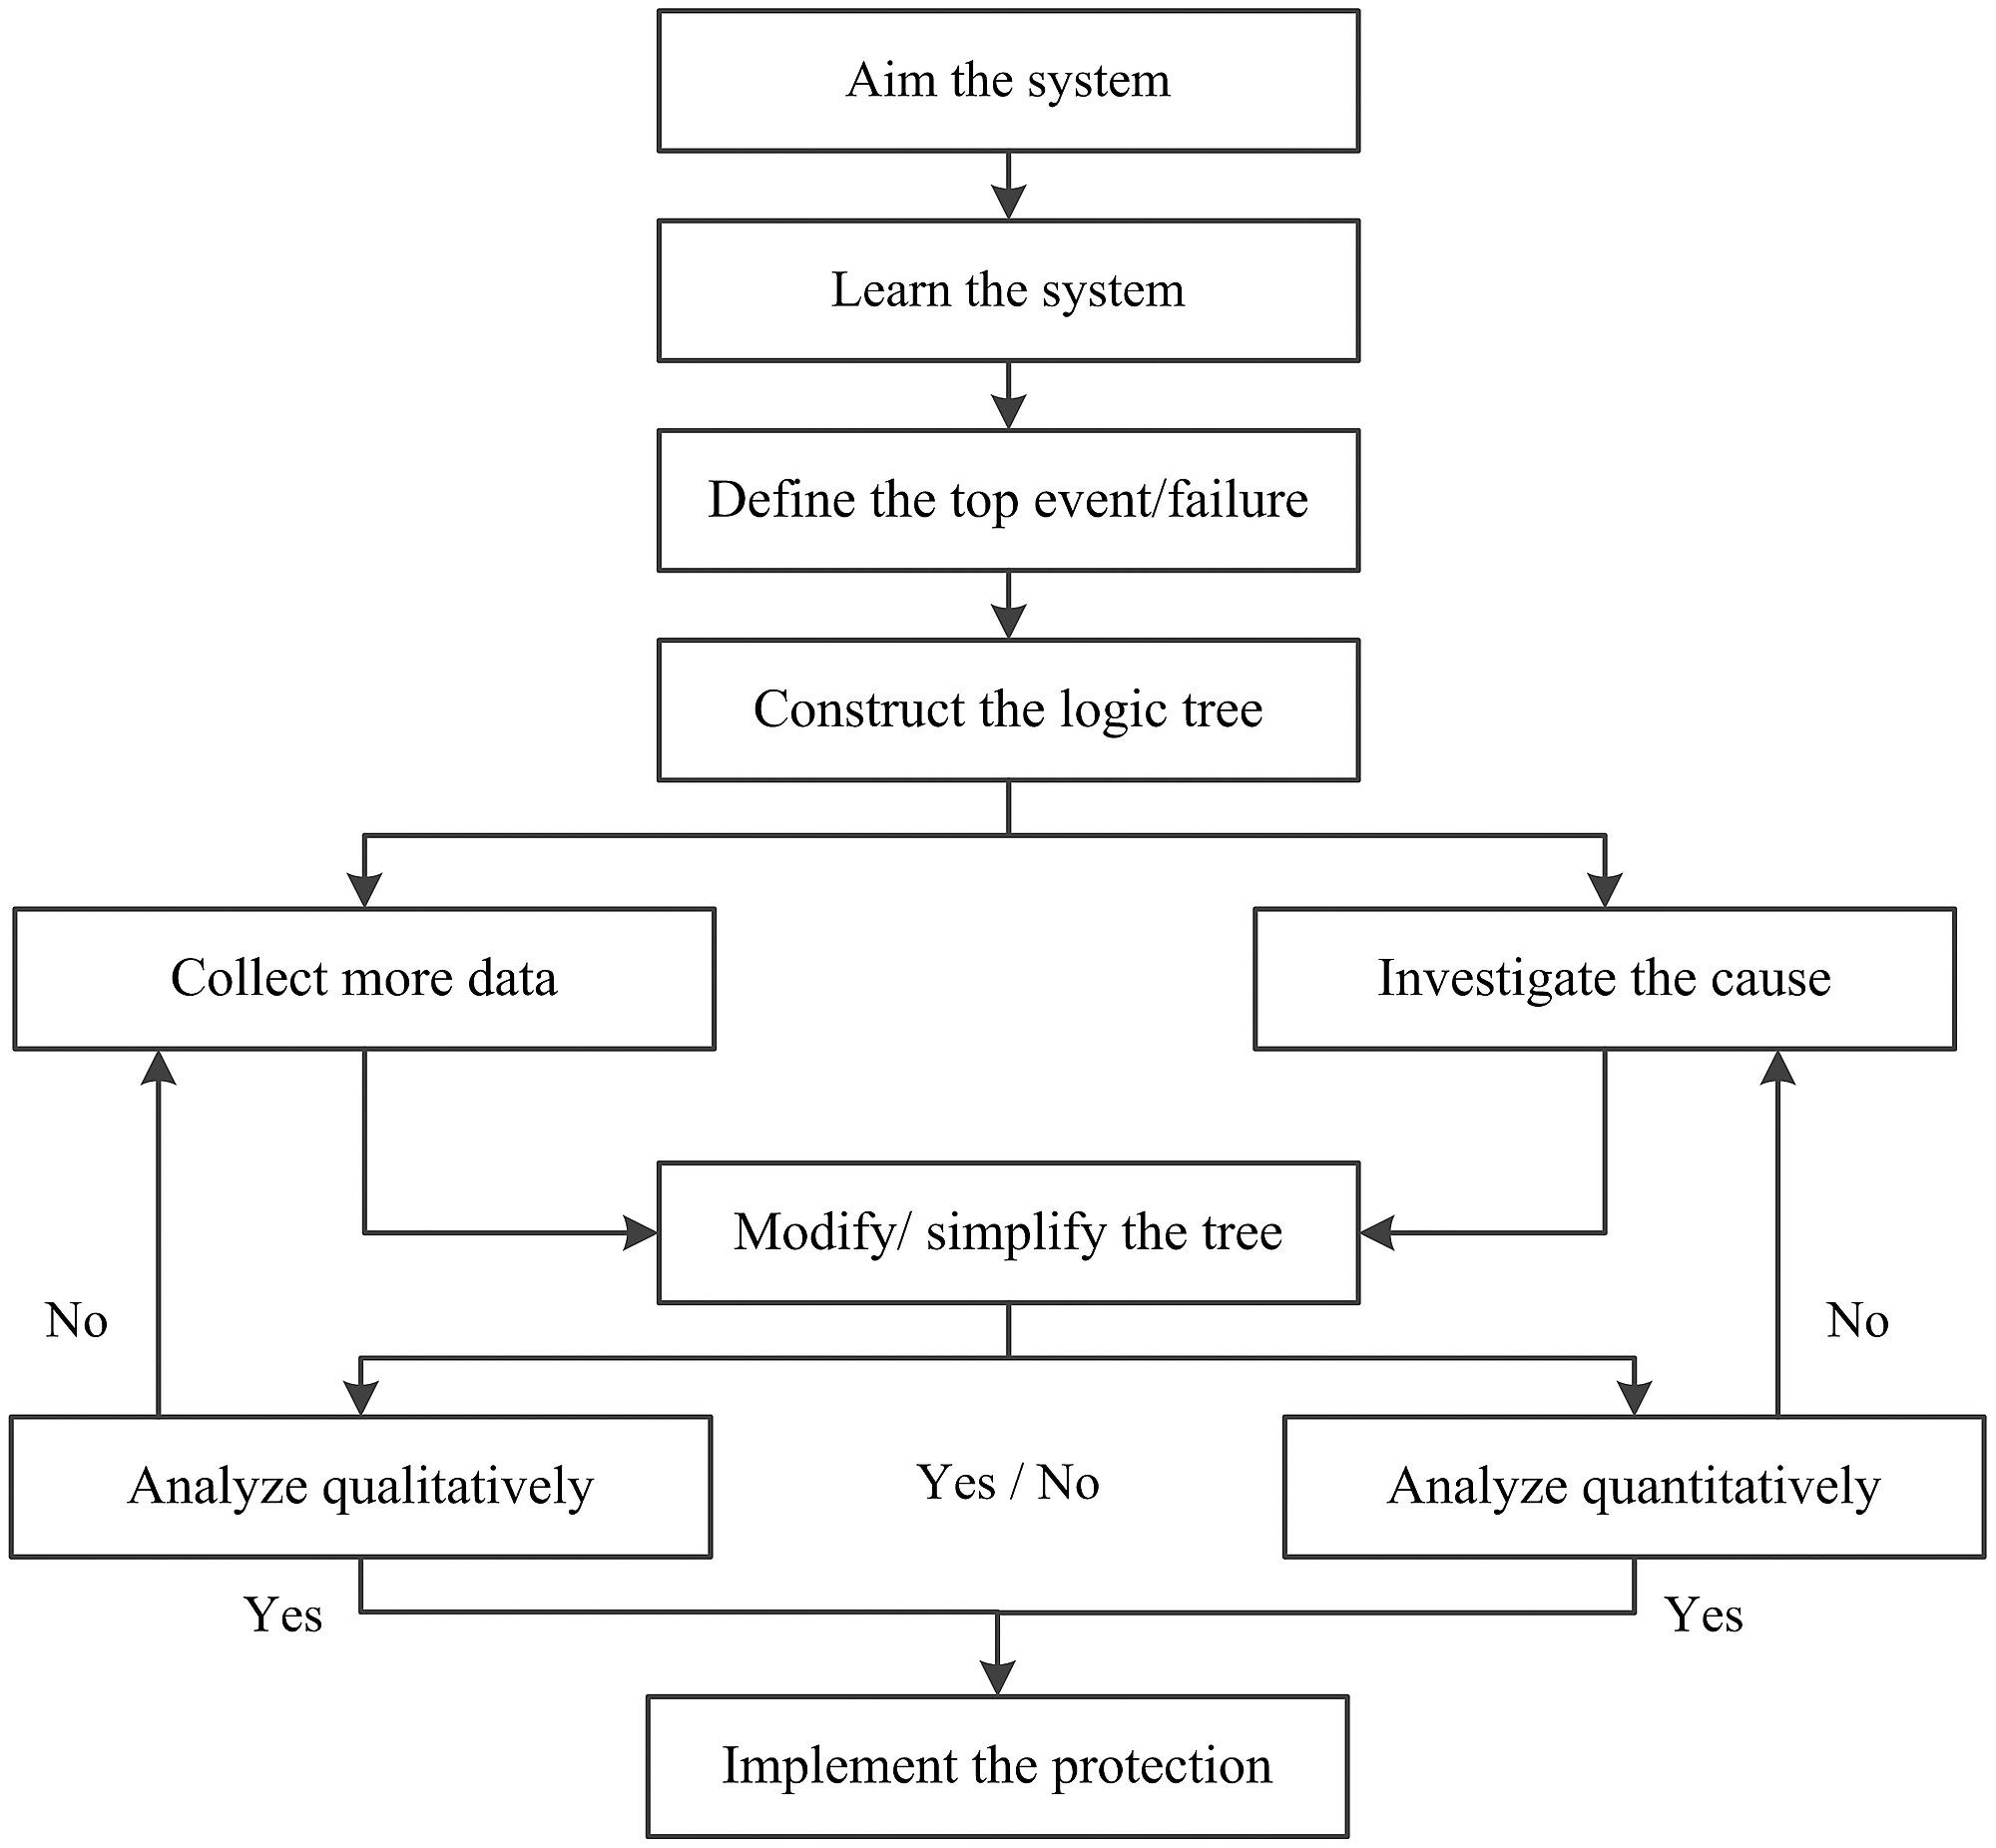 Process Flow Diagram For Development Of A Fta Logic Tree